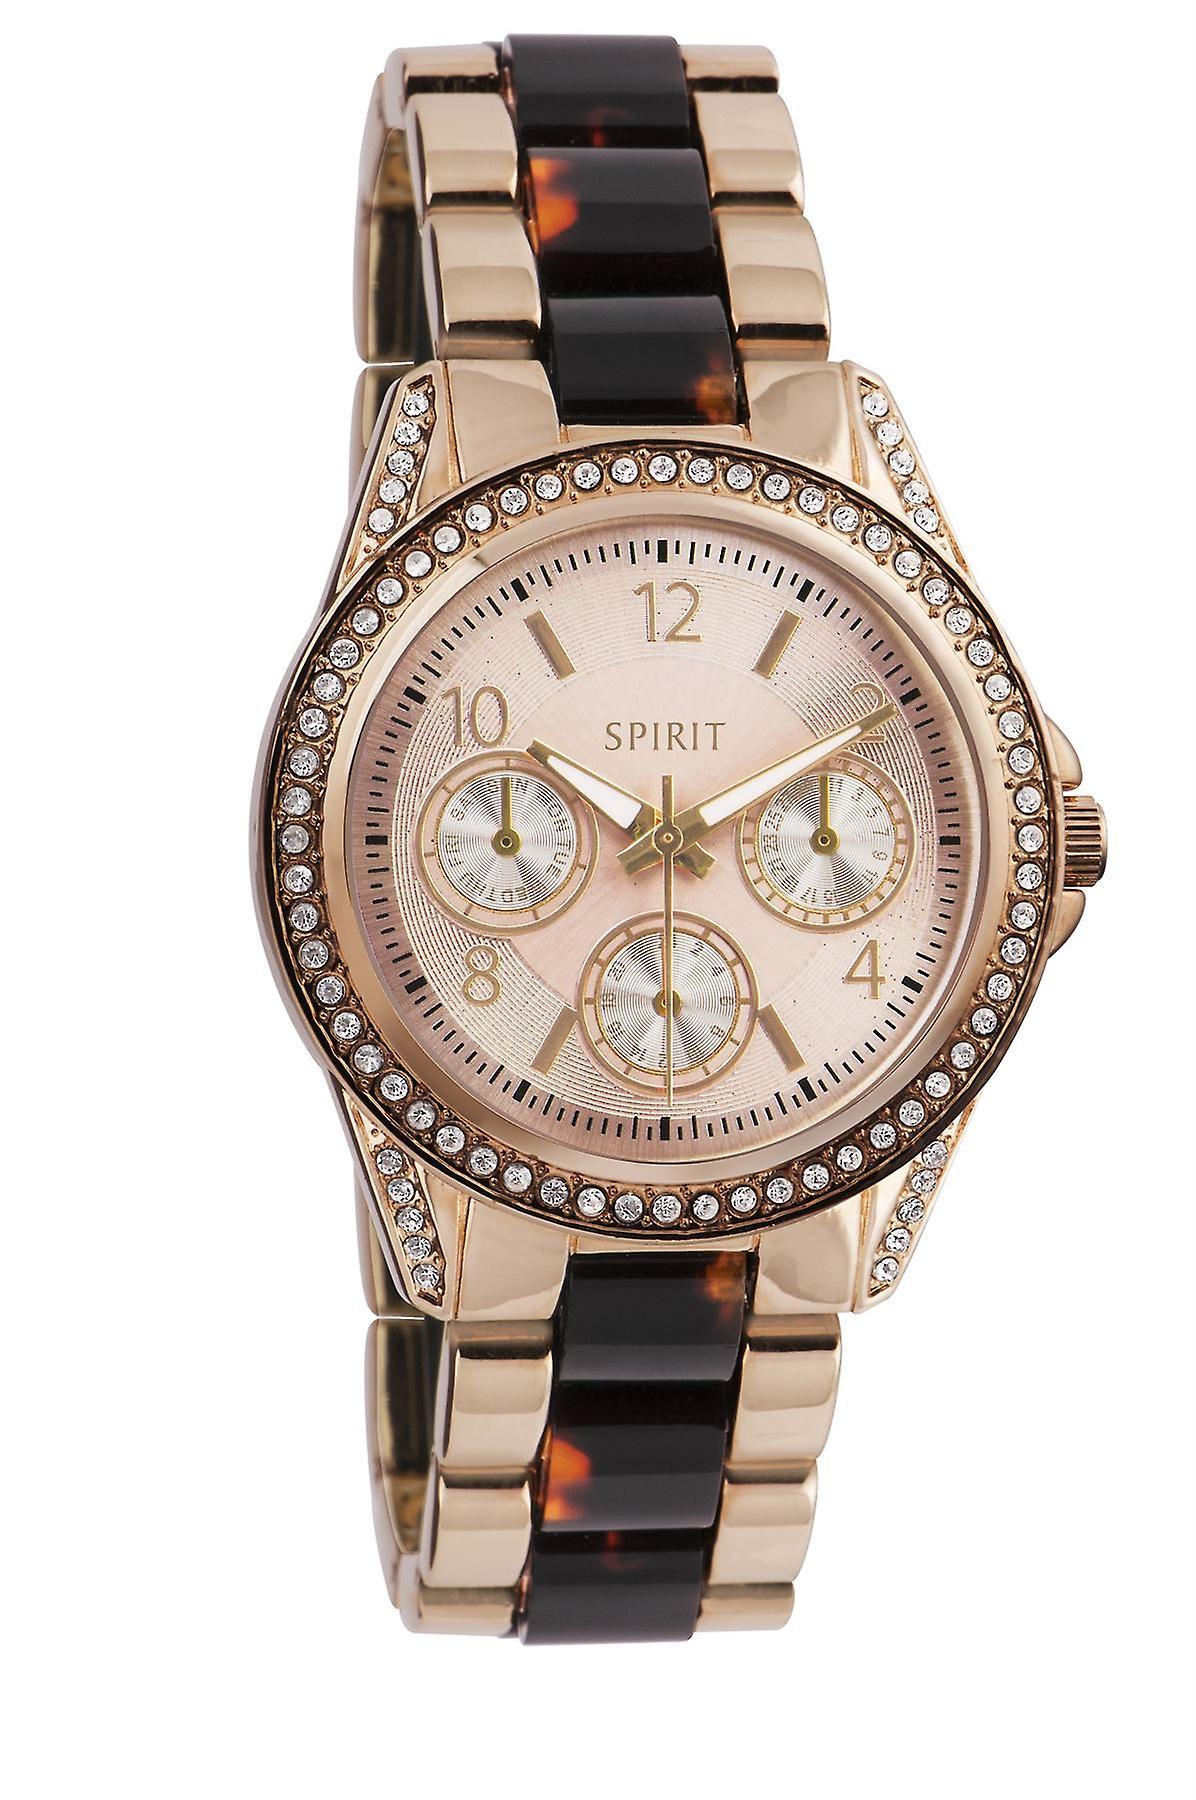 Esprit Mesdames Womens Rose Gold Tone Wrist Watch ASPL84X